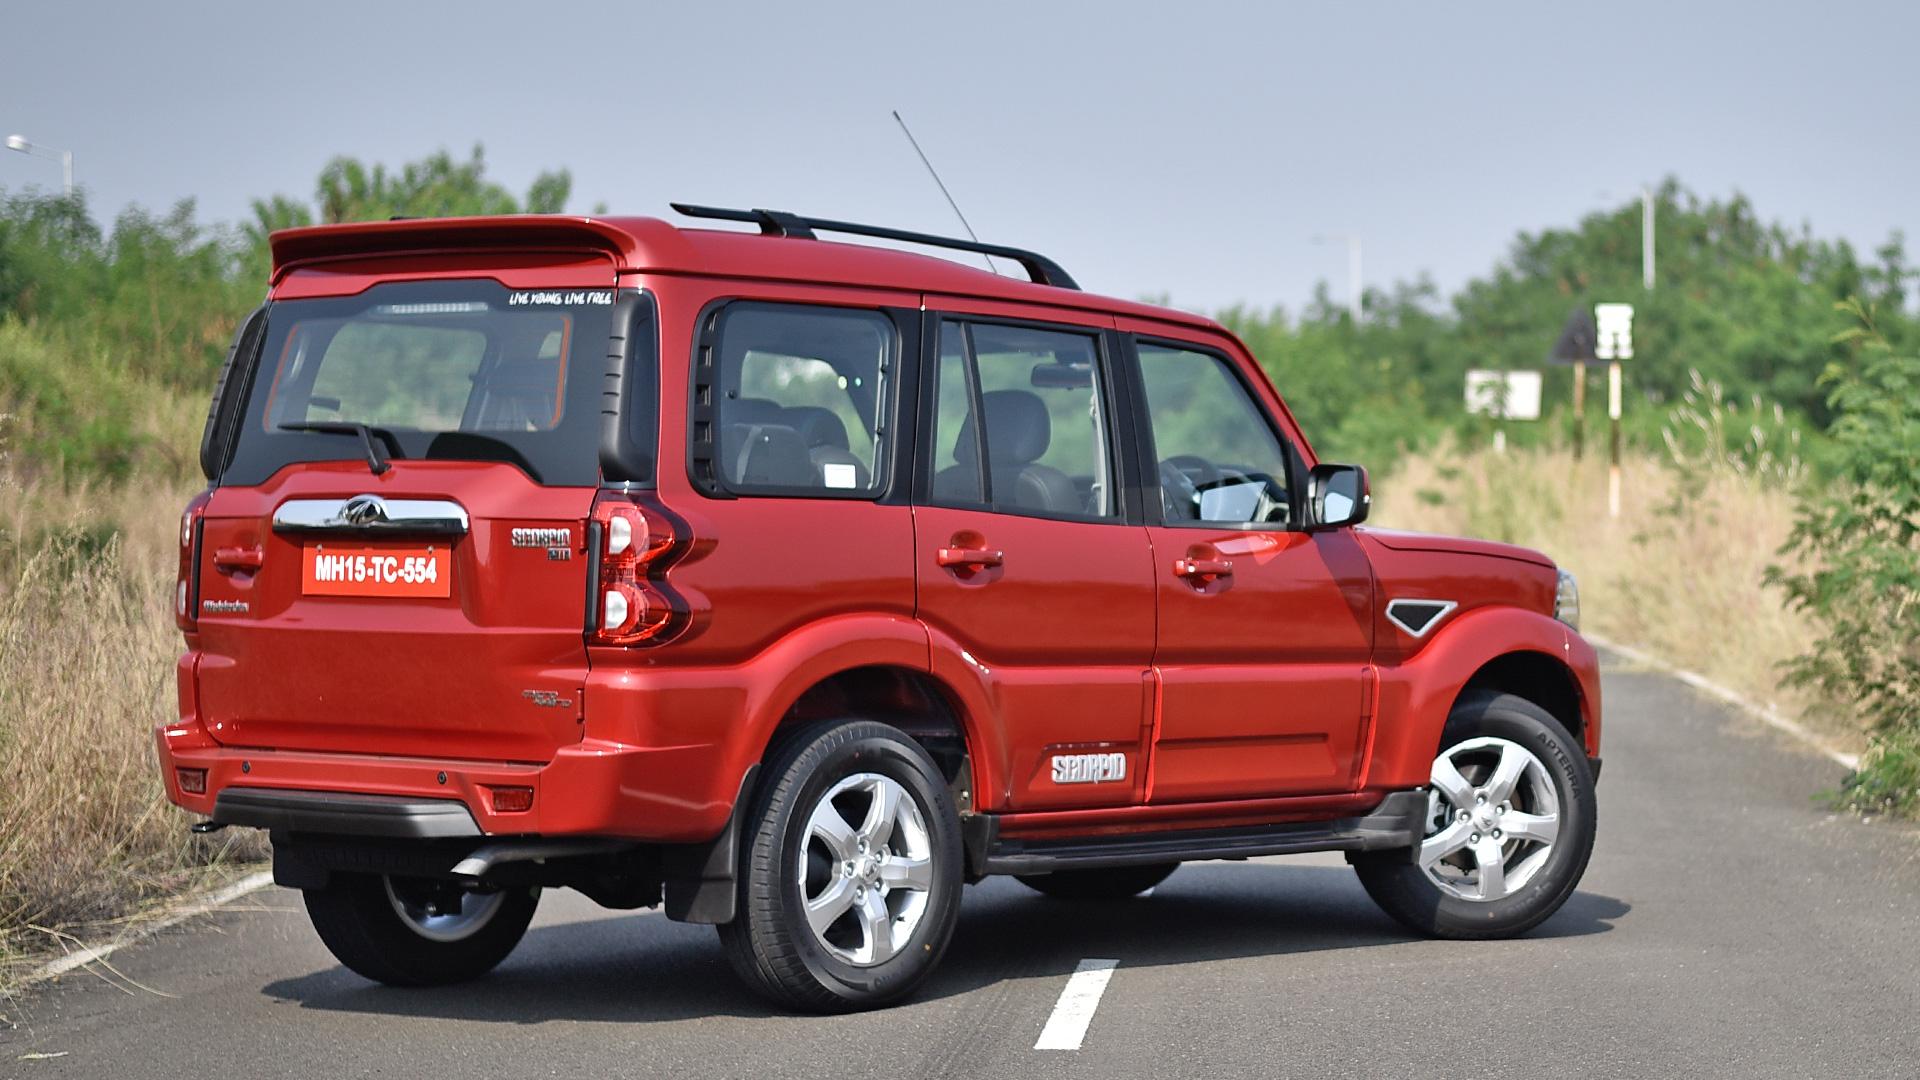 Mahindra launches new Scorpio S9 variant at Rs 13.99 lakh